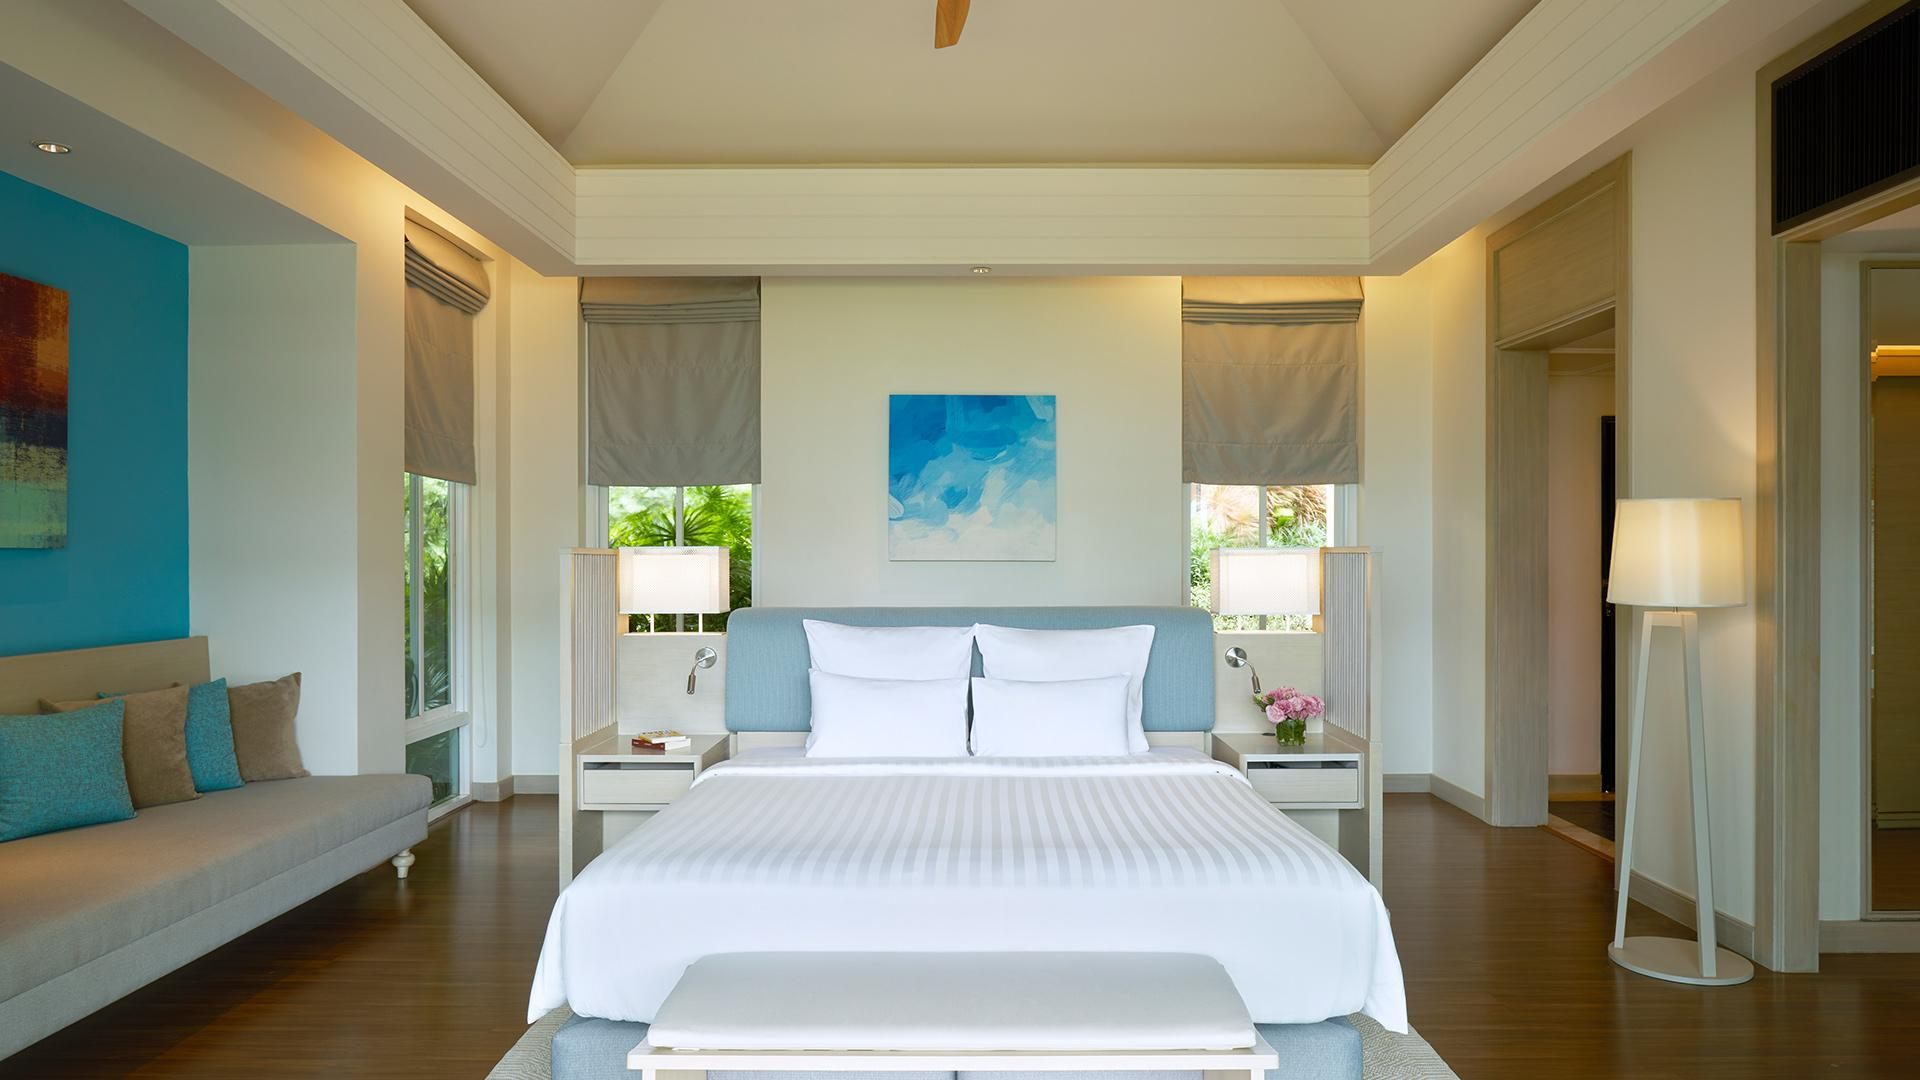 Pool Villa image 1 at Pullman Phuket Panwa Beach Resort by Amphoe Mueang Phuket, Chang Wat Phuket, Thailand